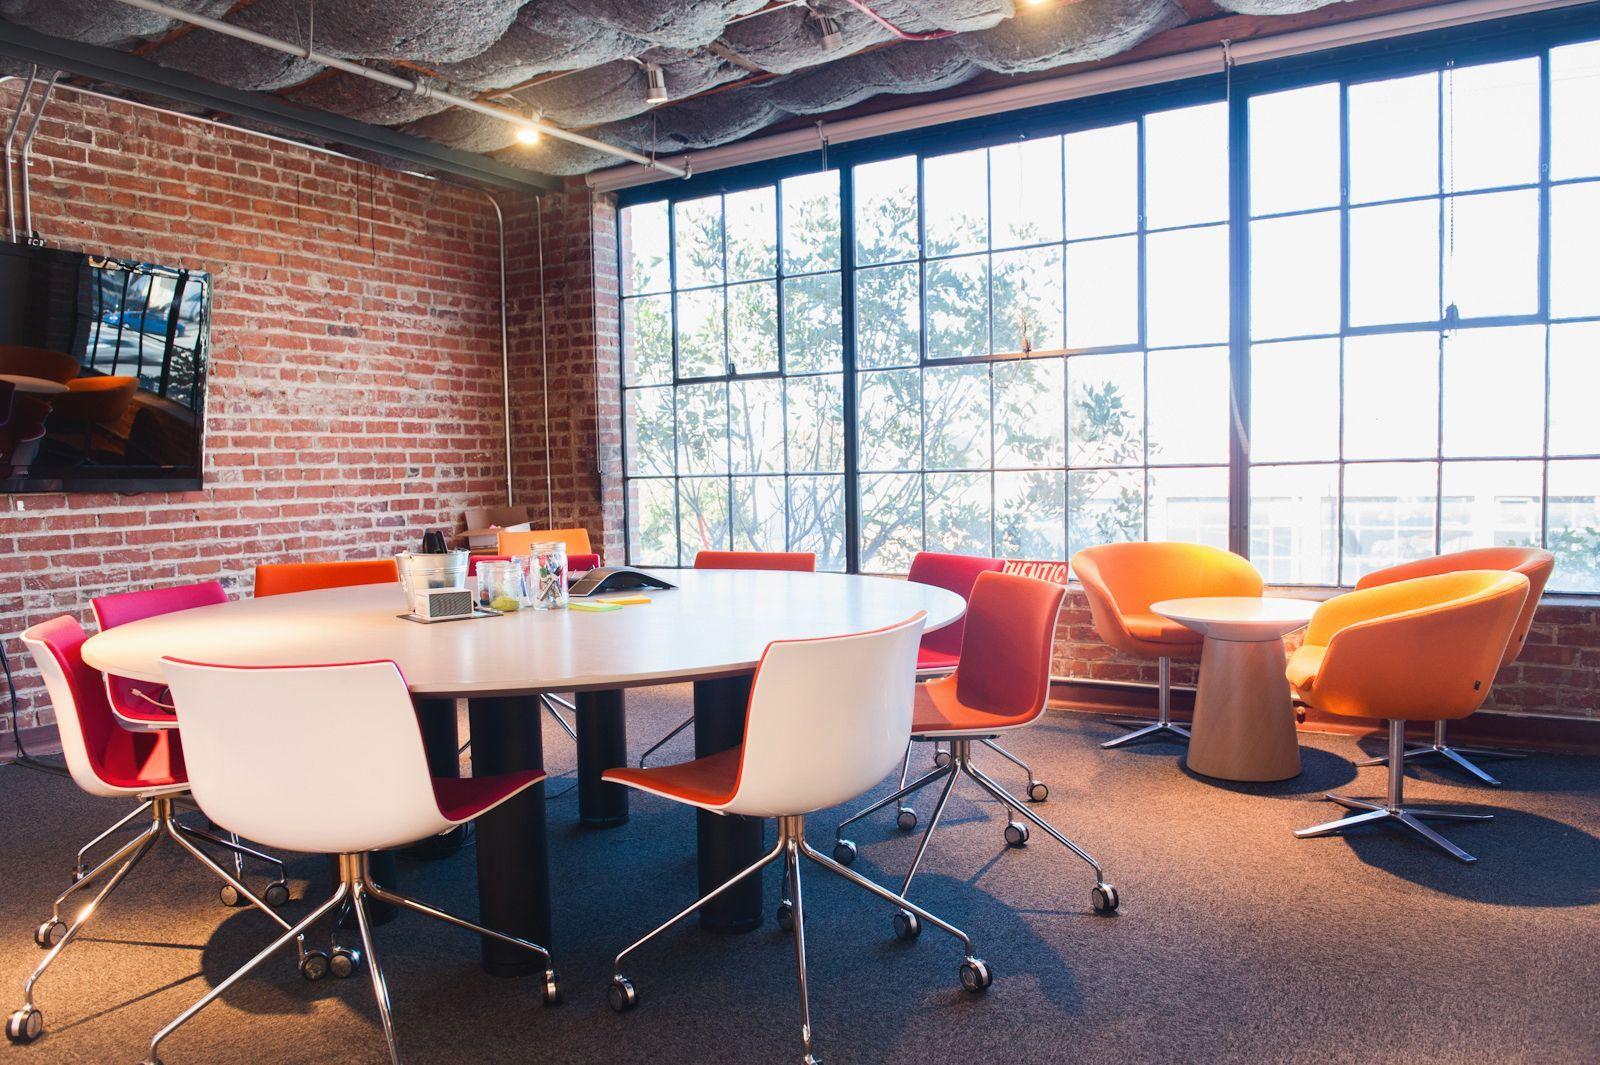 Pinterest Office Tour San Francisco Tech Headquarters Workspace Design Modern Office Space Cool Office Space